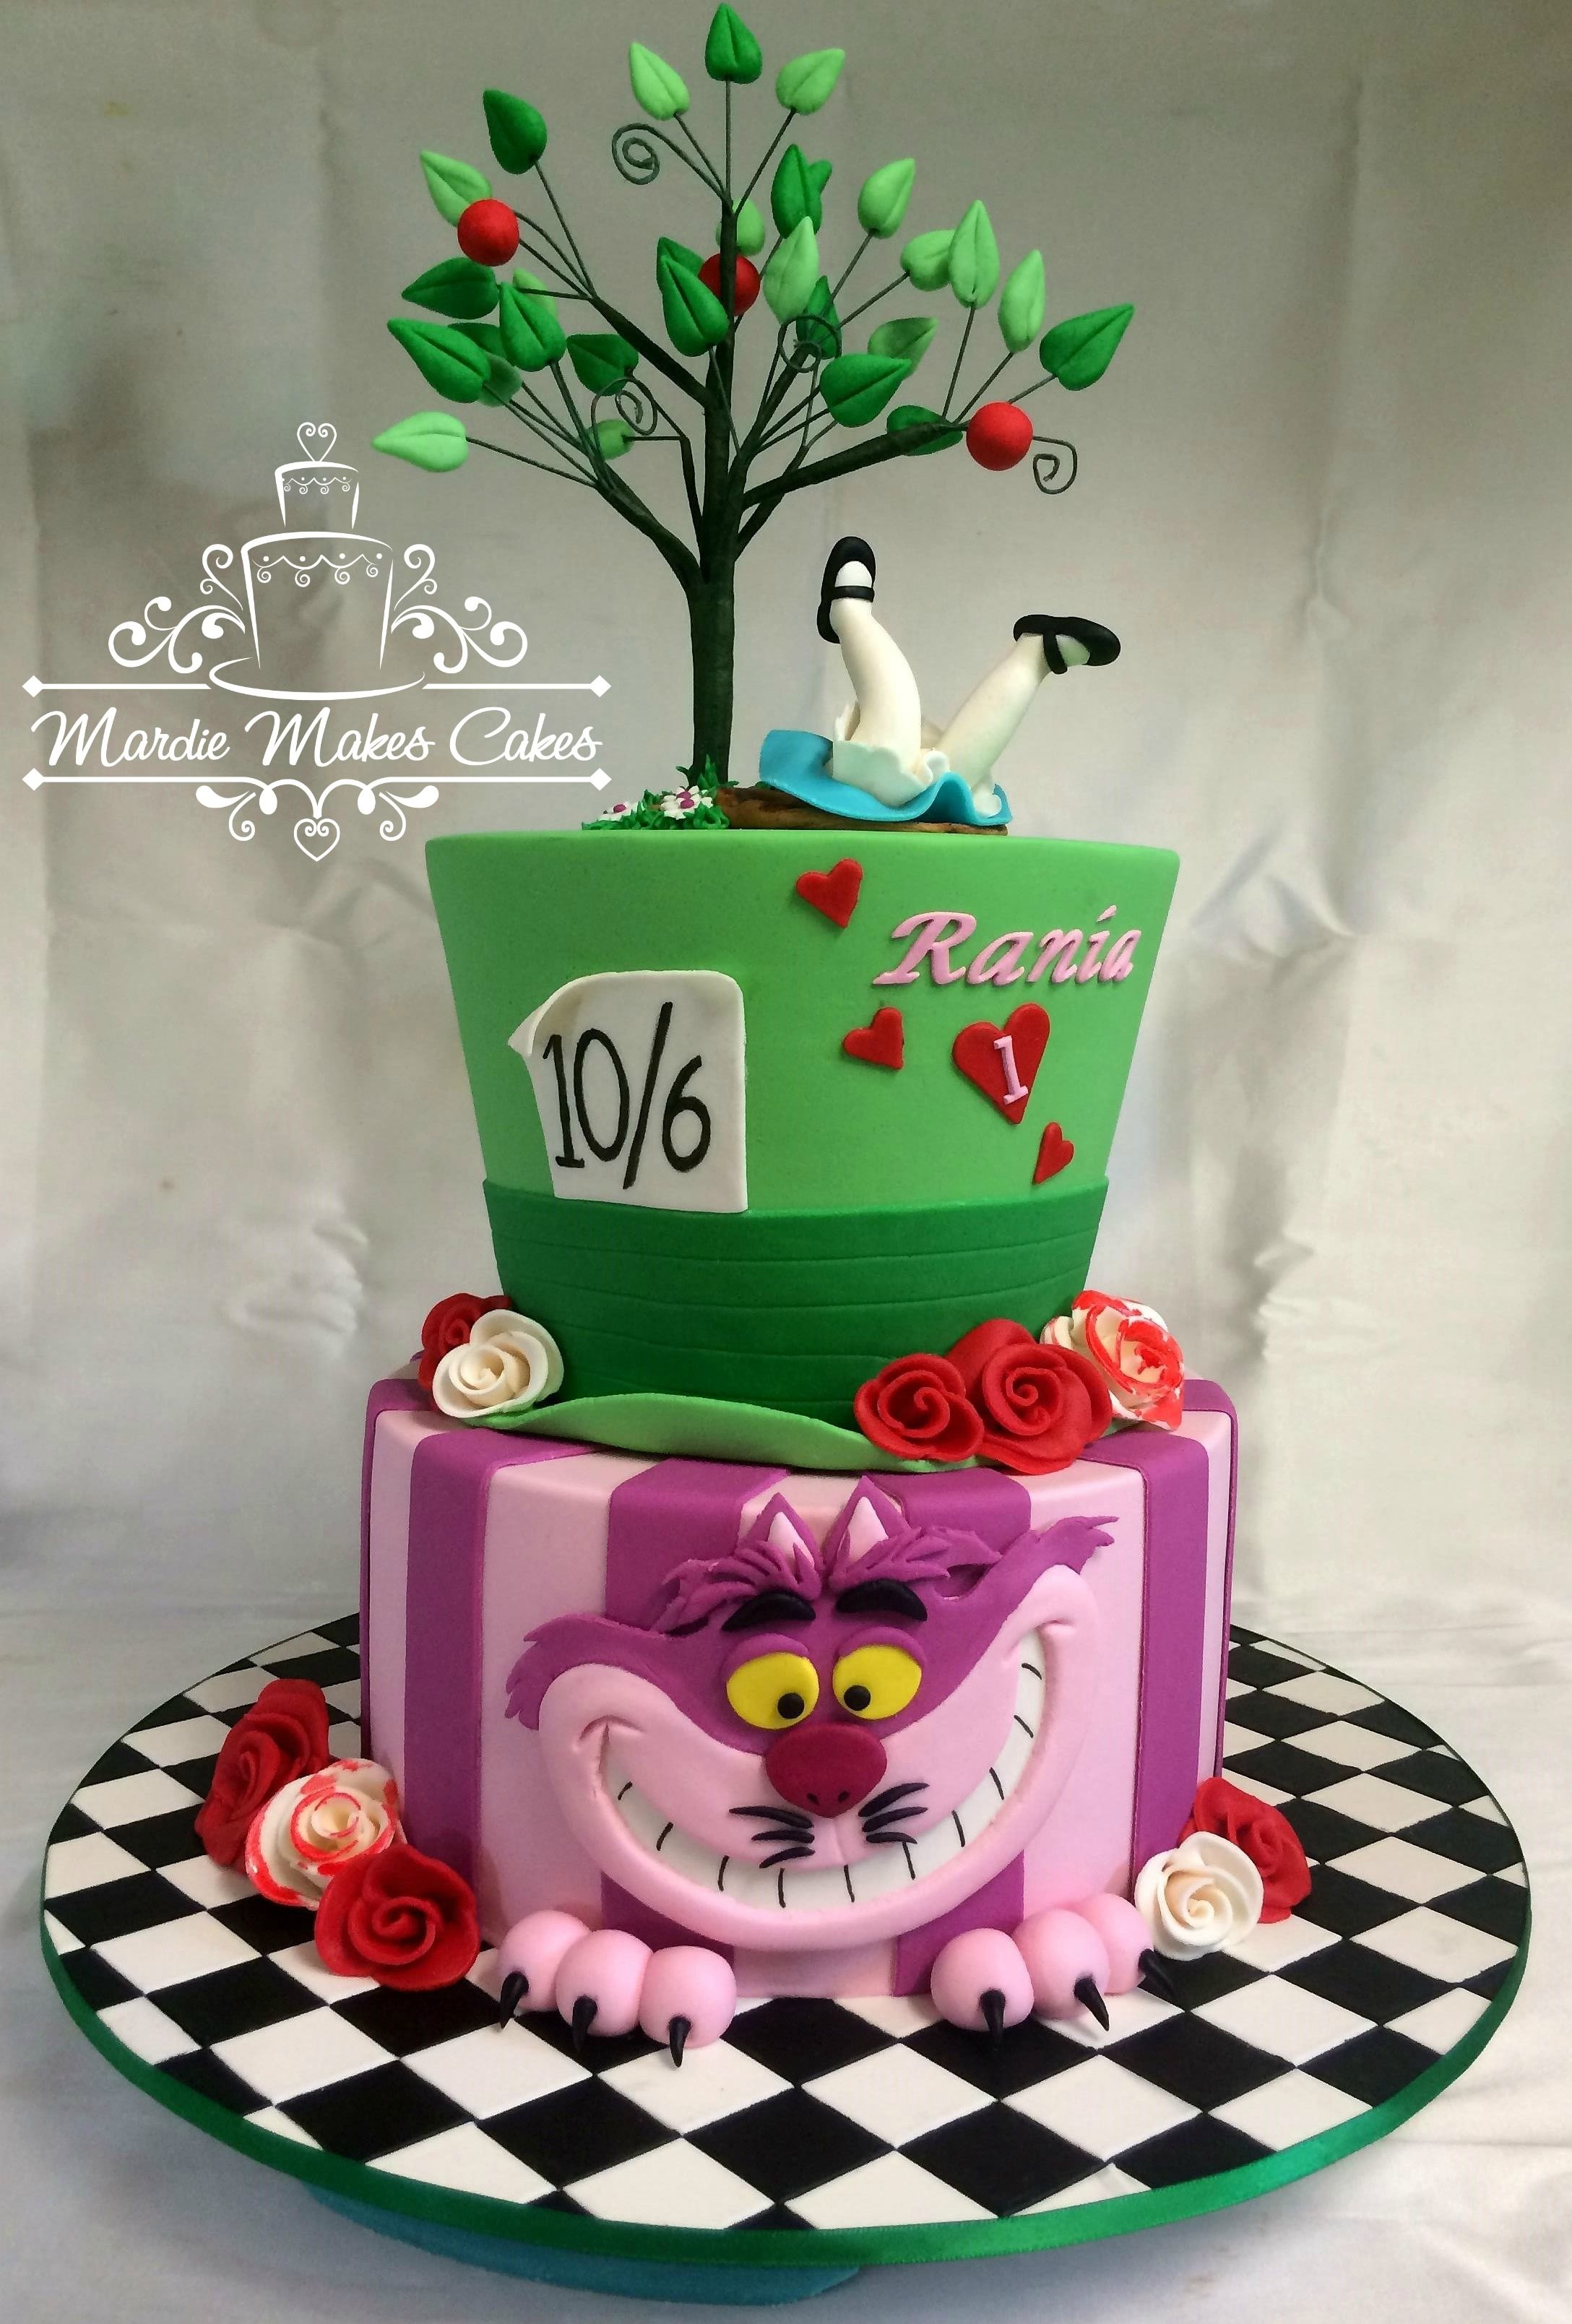 Alice in Wonderland: Chesire,Sombrerero, Alicia Cake | Tea party ...